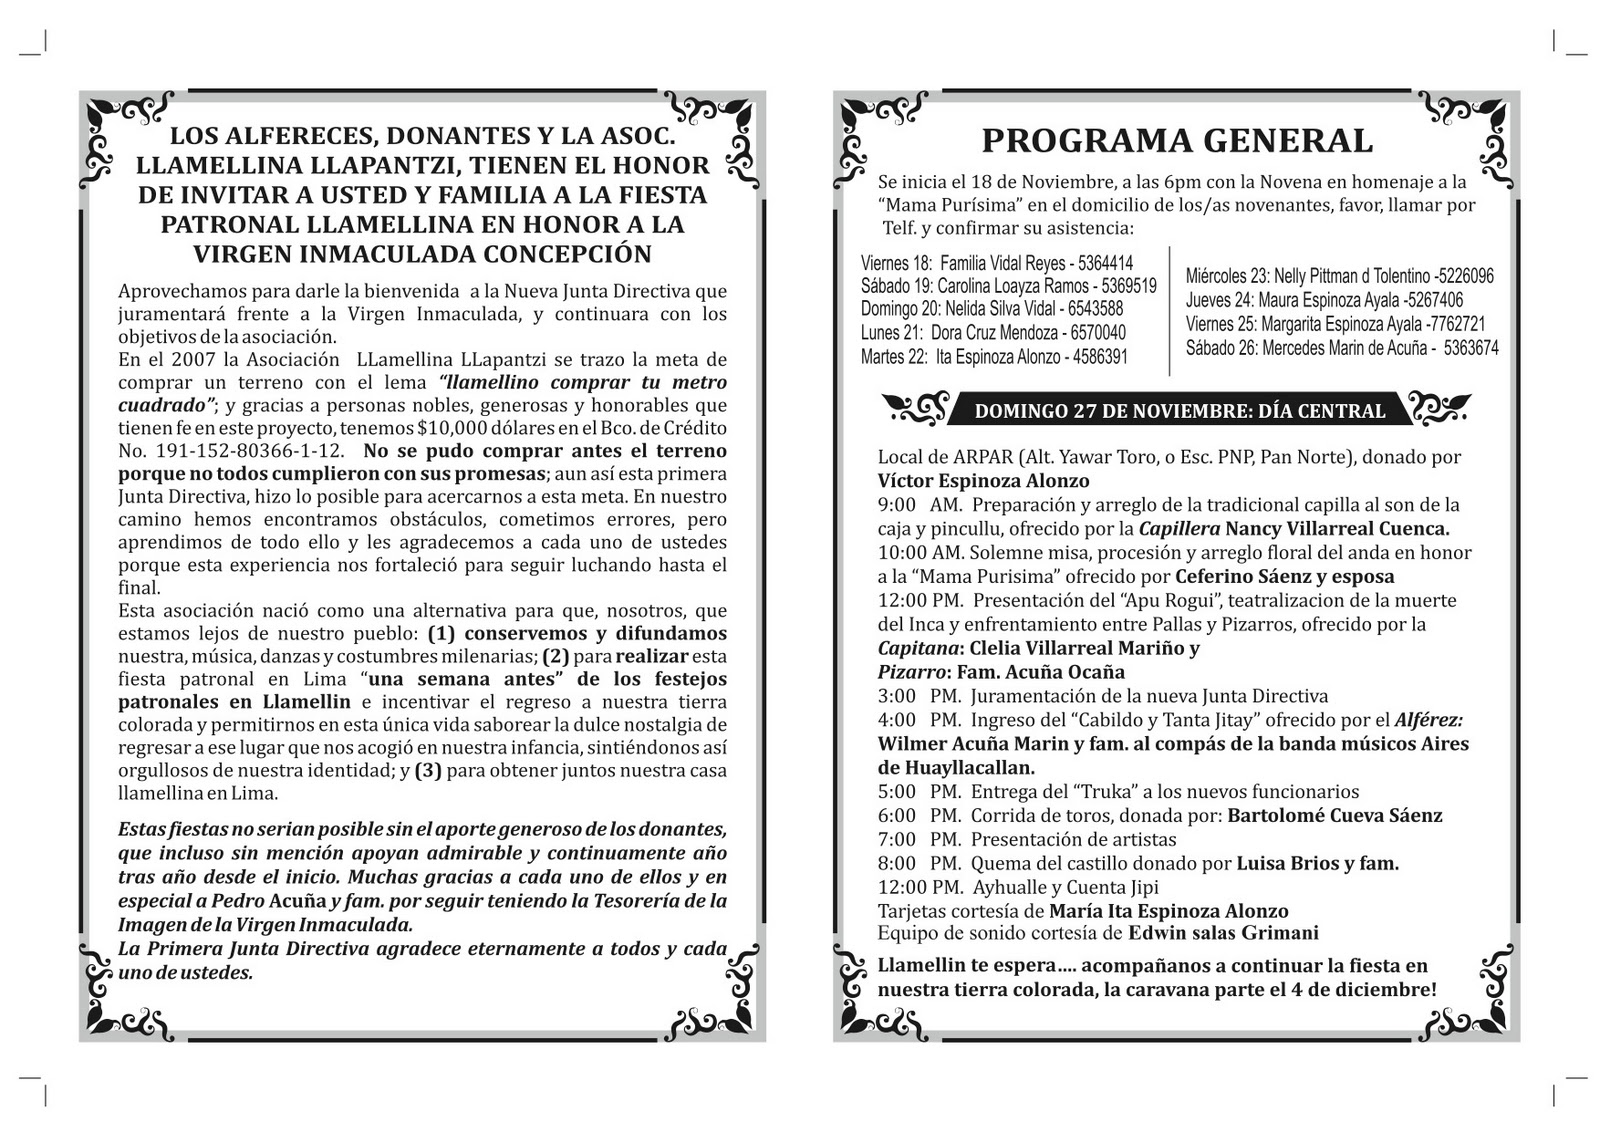 Asociacion Llamellina Llapantzi En Lima La Fiesta Patronal